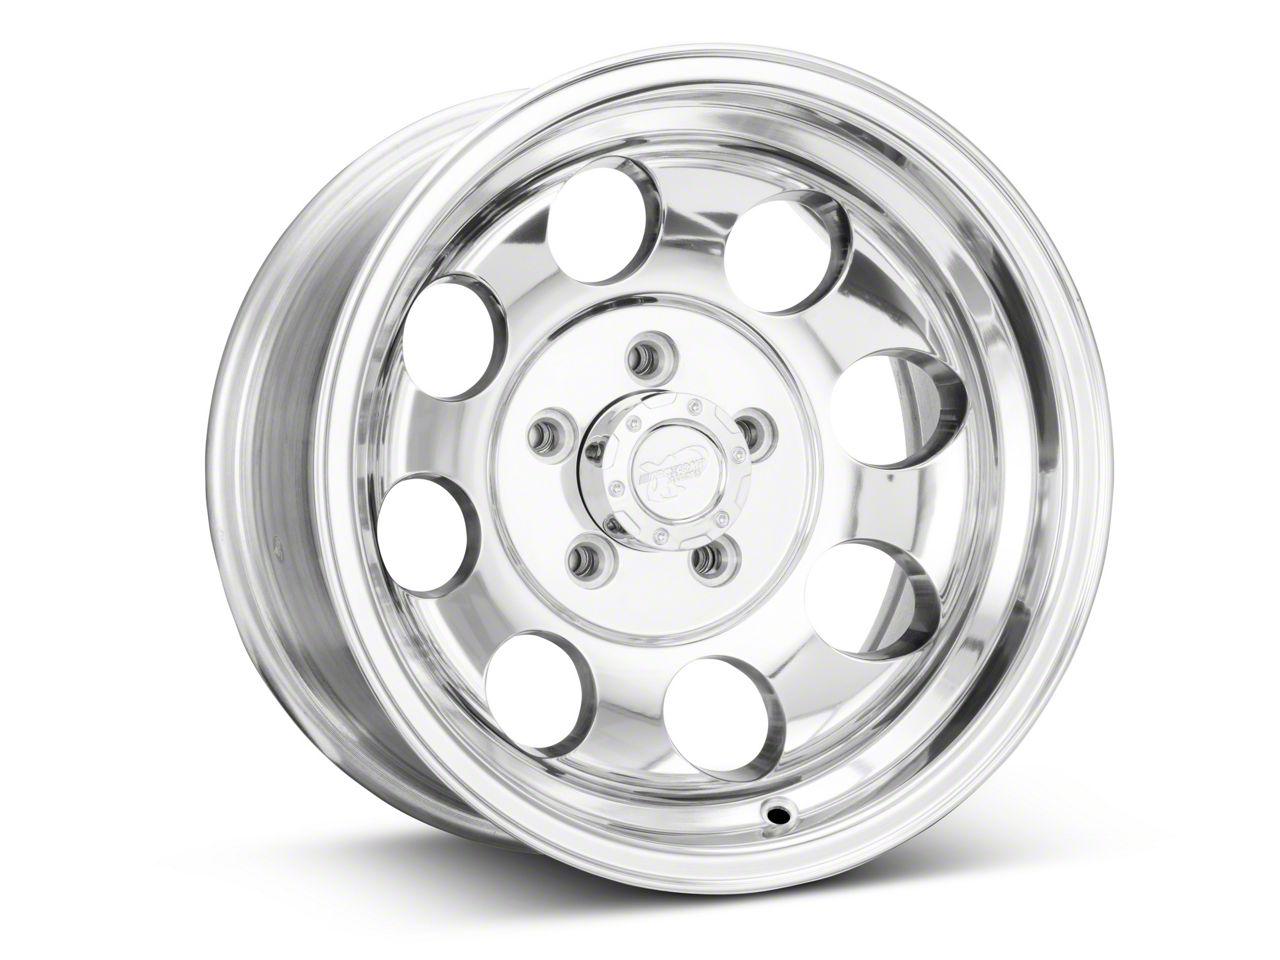 Pro Comp Wheels Series 1069 Polished 15x8 Wheel & Mickey Thompson Deegan 38 31x10.50R15 Tire Kit (87-06 Jeep Wrangler YJ & TJ)